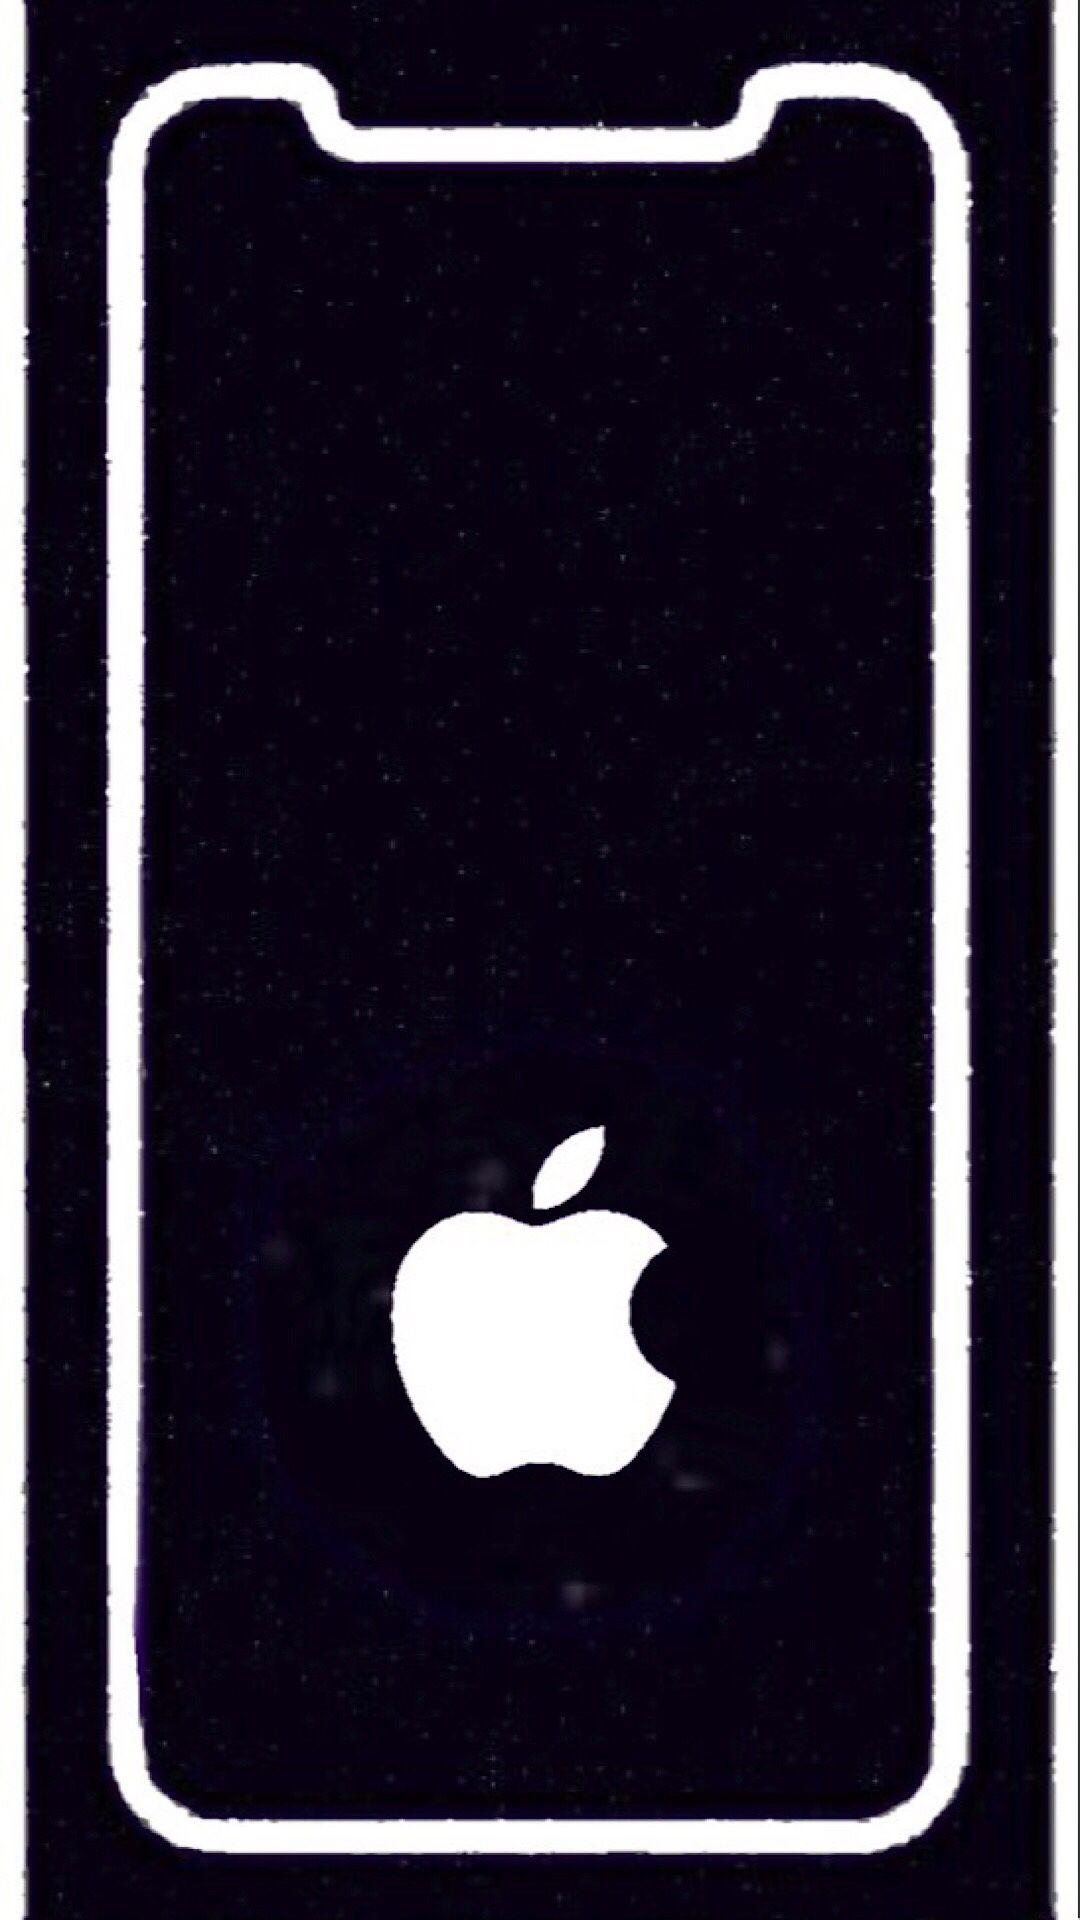 New Iphone Wallpaper Iphone Wallpaper Iphone Wallpaper Wallpaper Border Apple Wallpaper